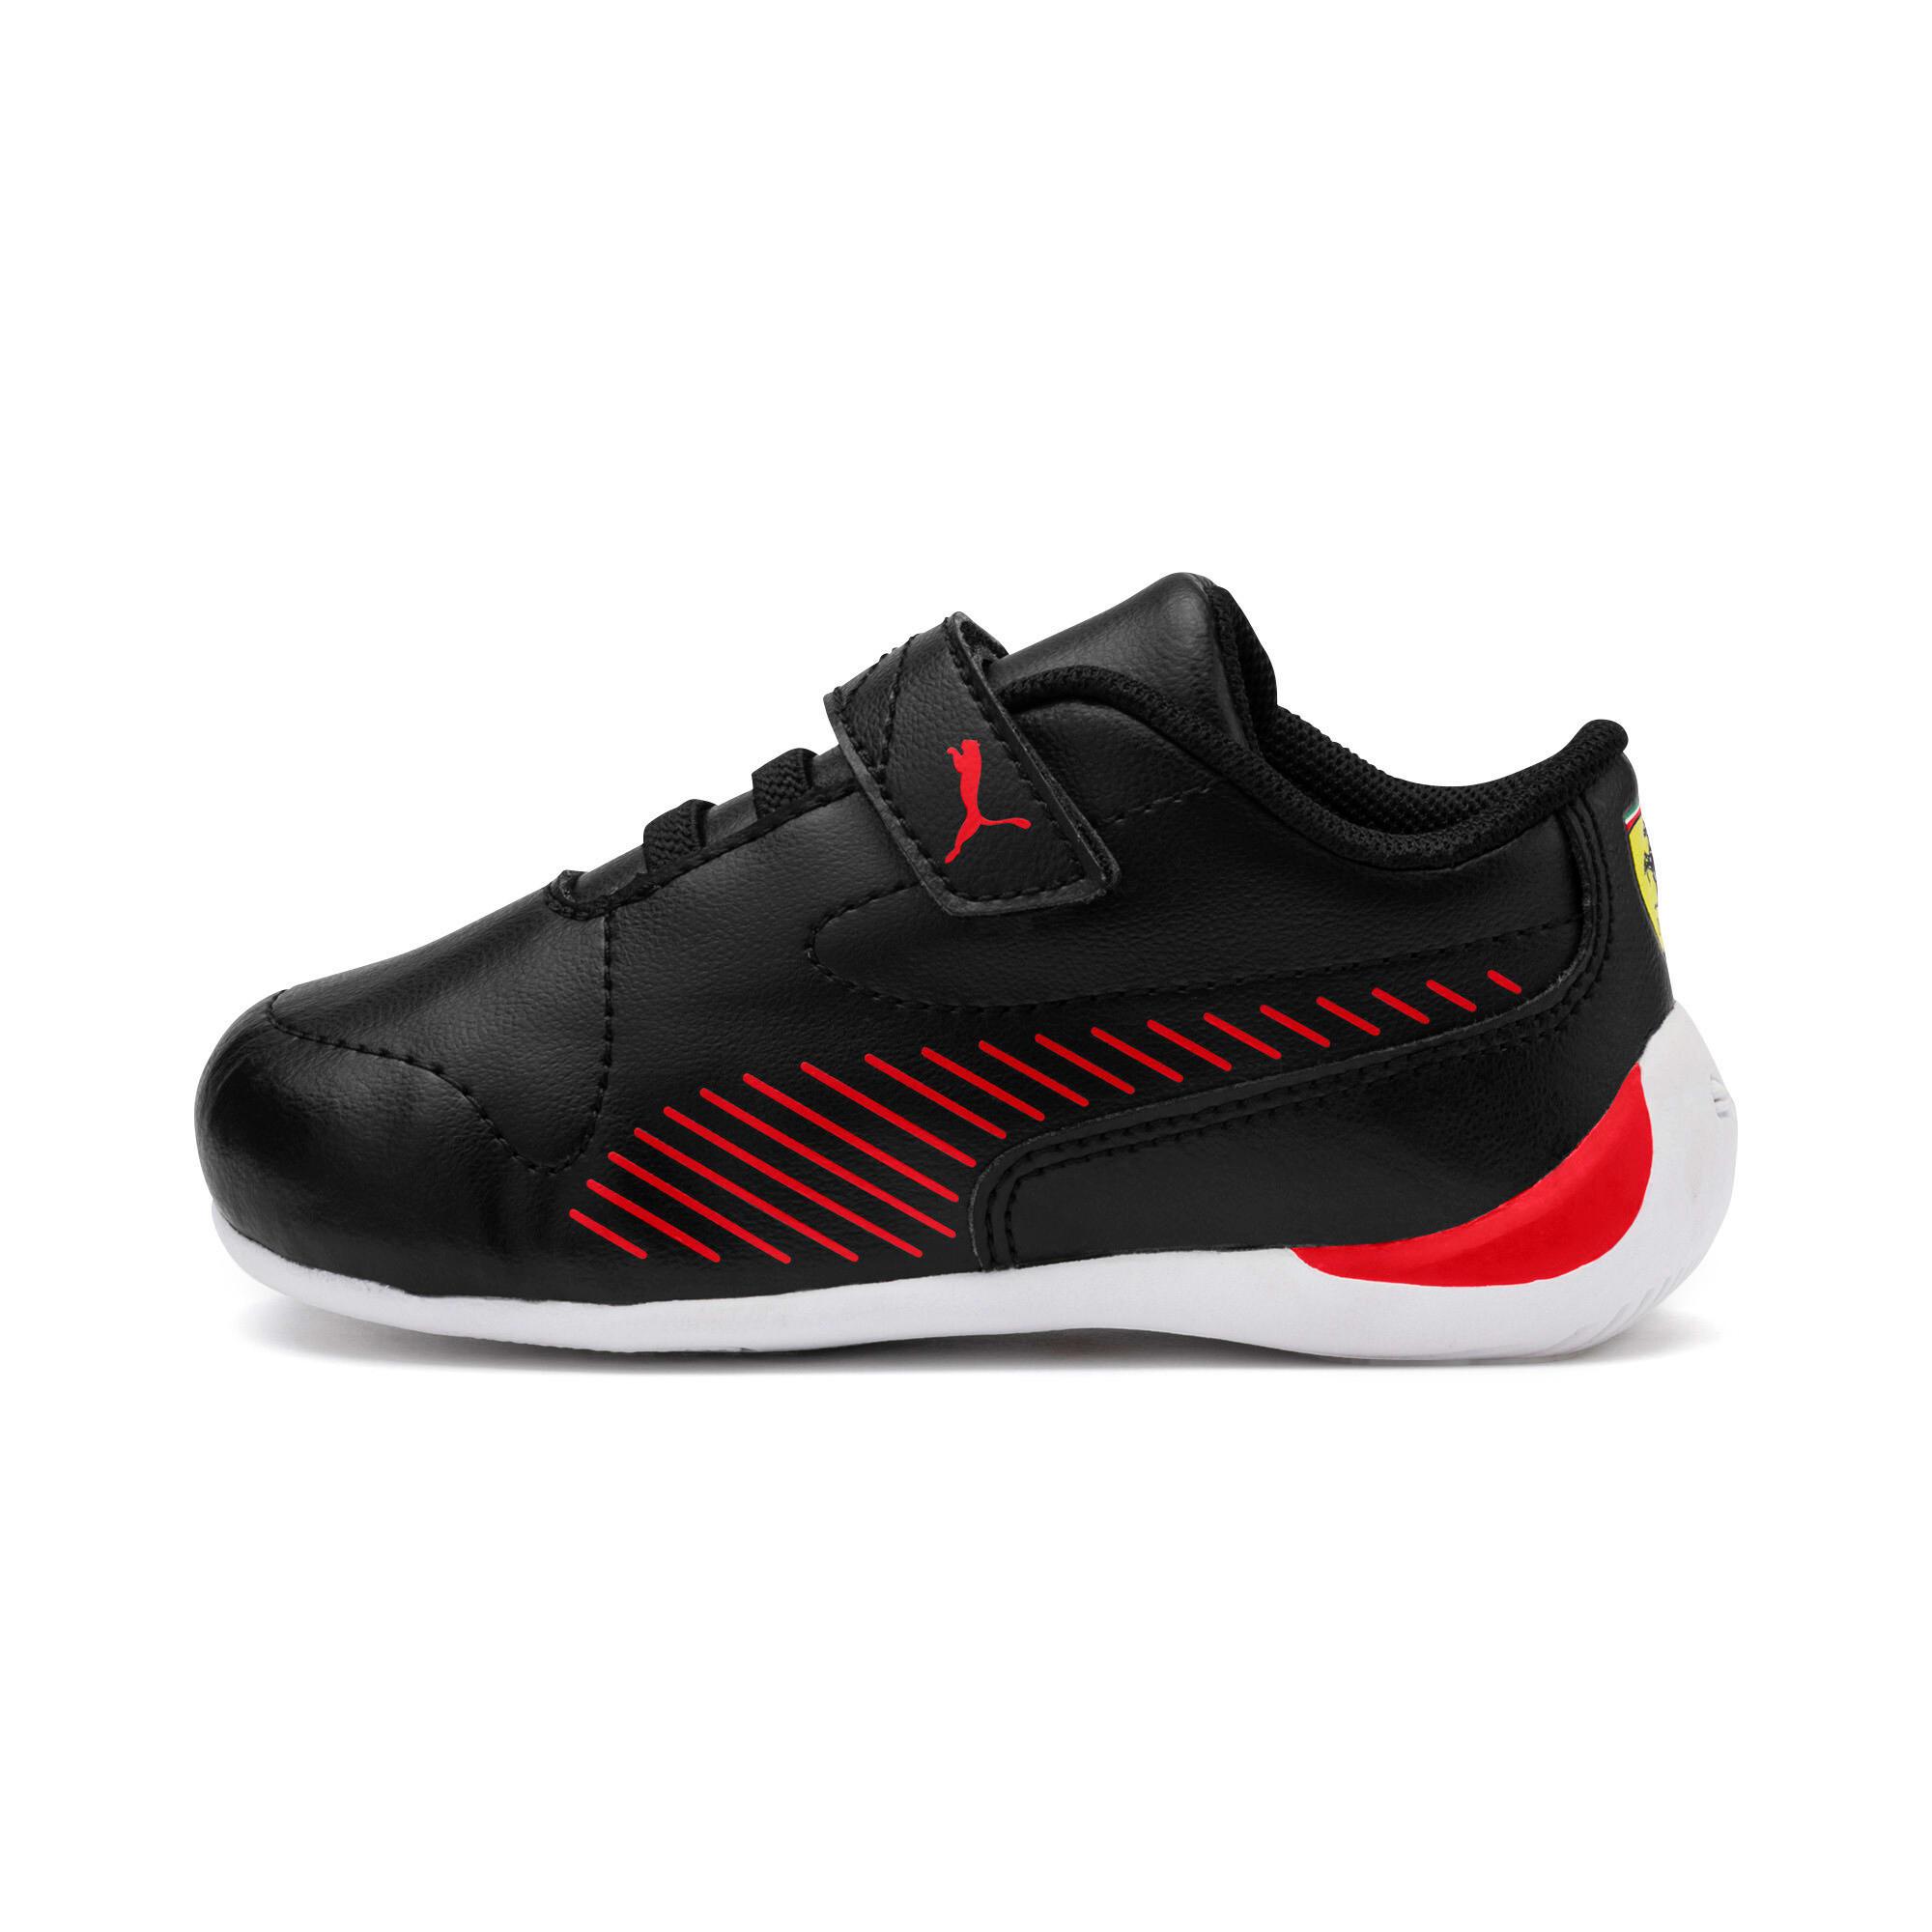 Thumbnail 1 of Ferrari Drift Cat 7S Ultra Kids Sneaker, Puma Black-Rosso Corsa, medium